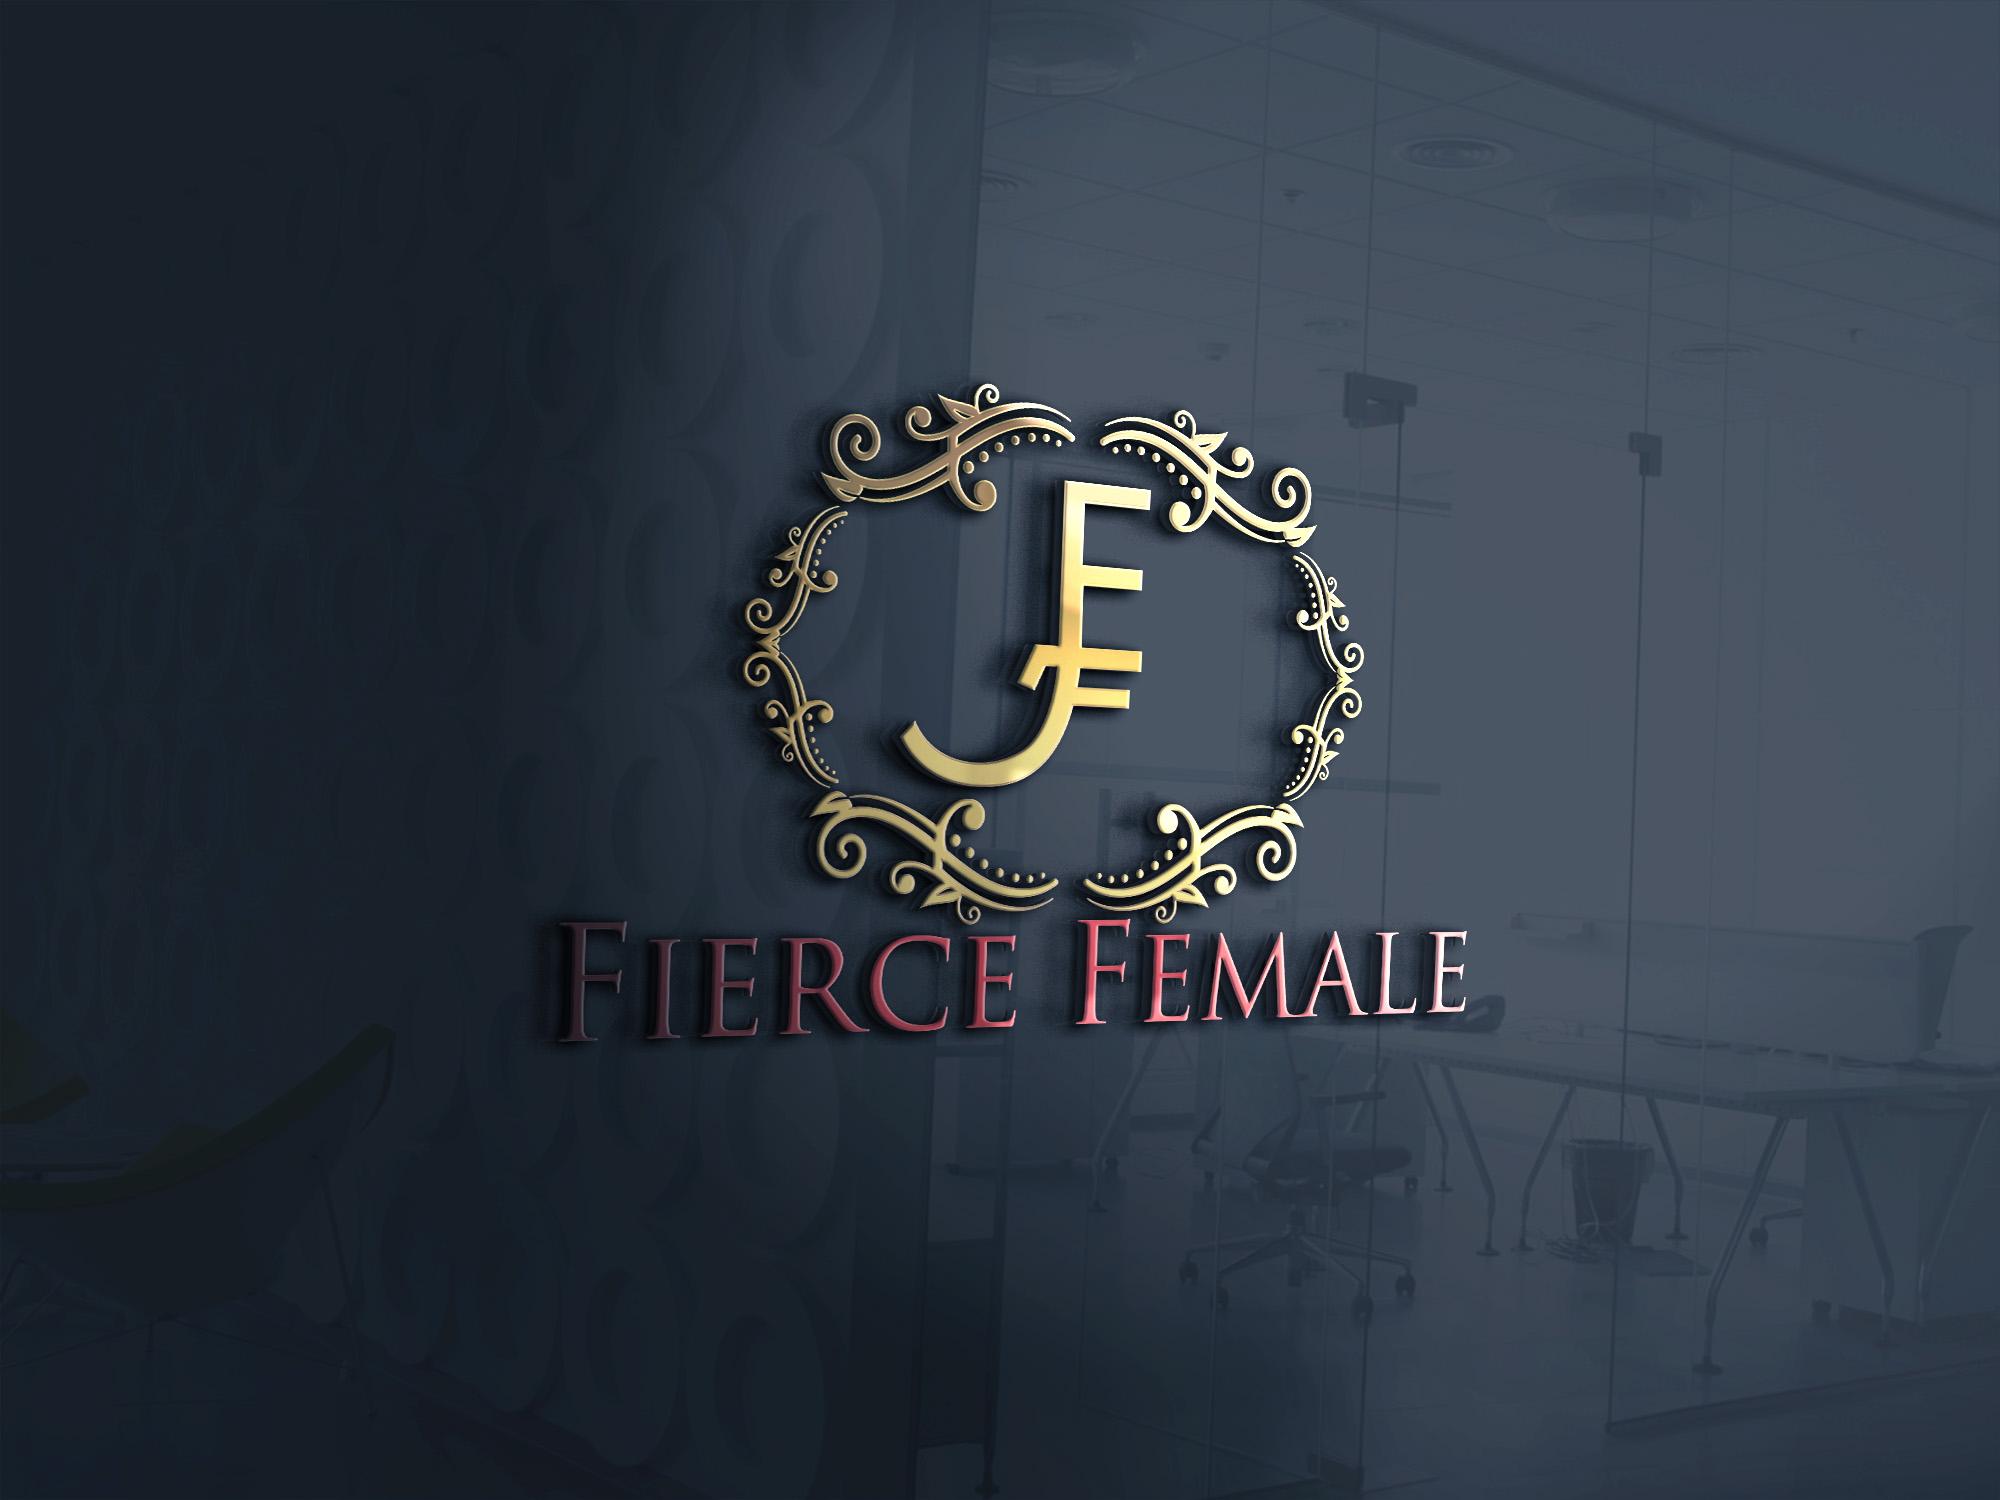 The Fierce Female Network  album art